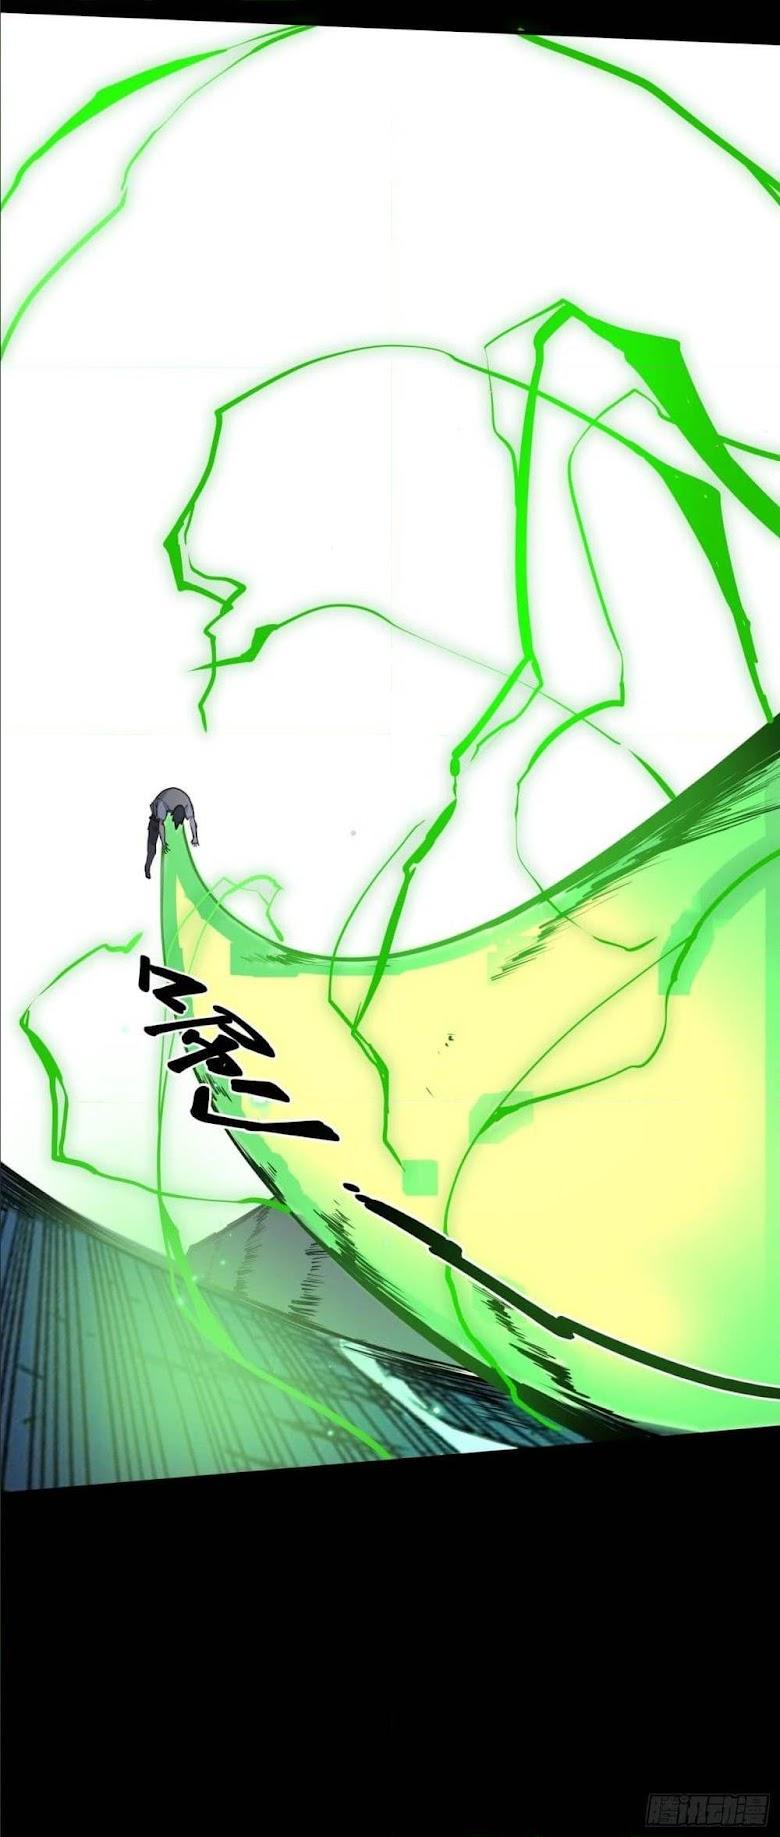 SiYe Ren - หน้า 88